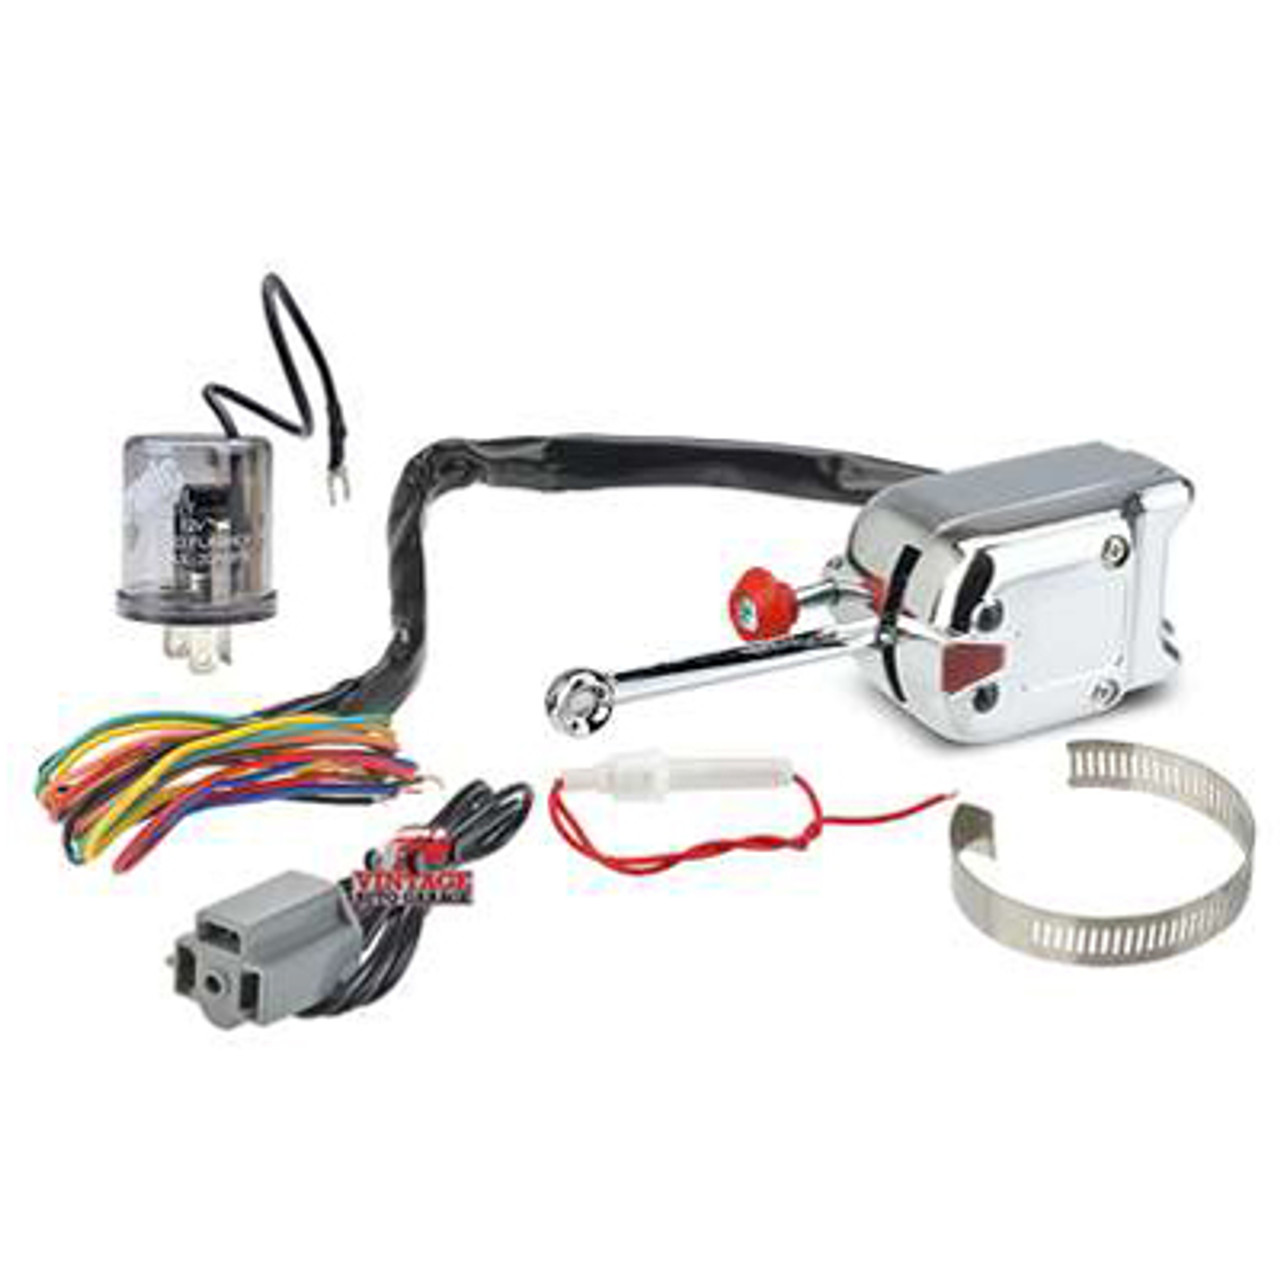 Heavy Duty 12 V Turn Signal With LED & Standard bulb Flasher - 5007RK